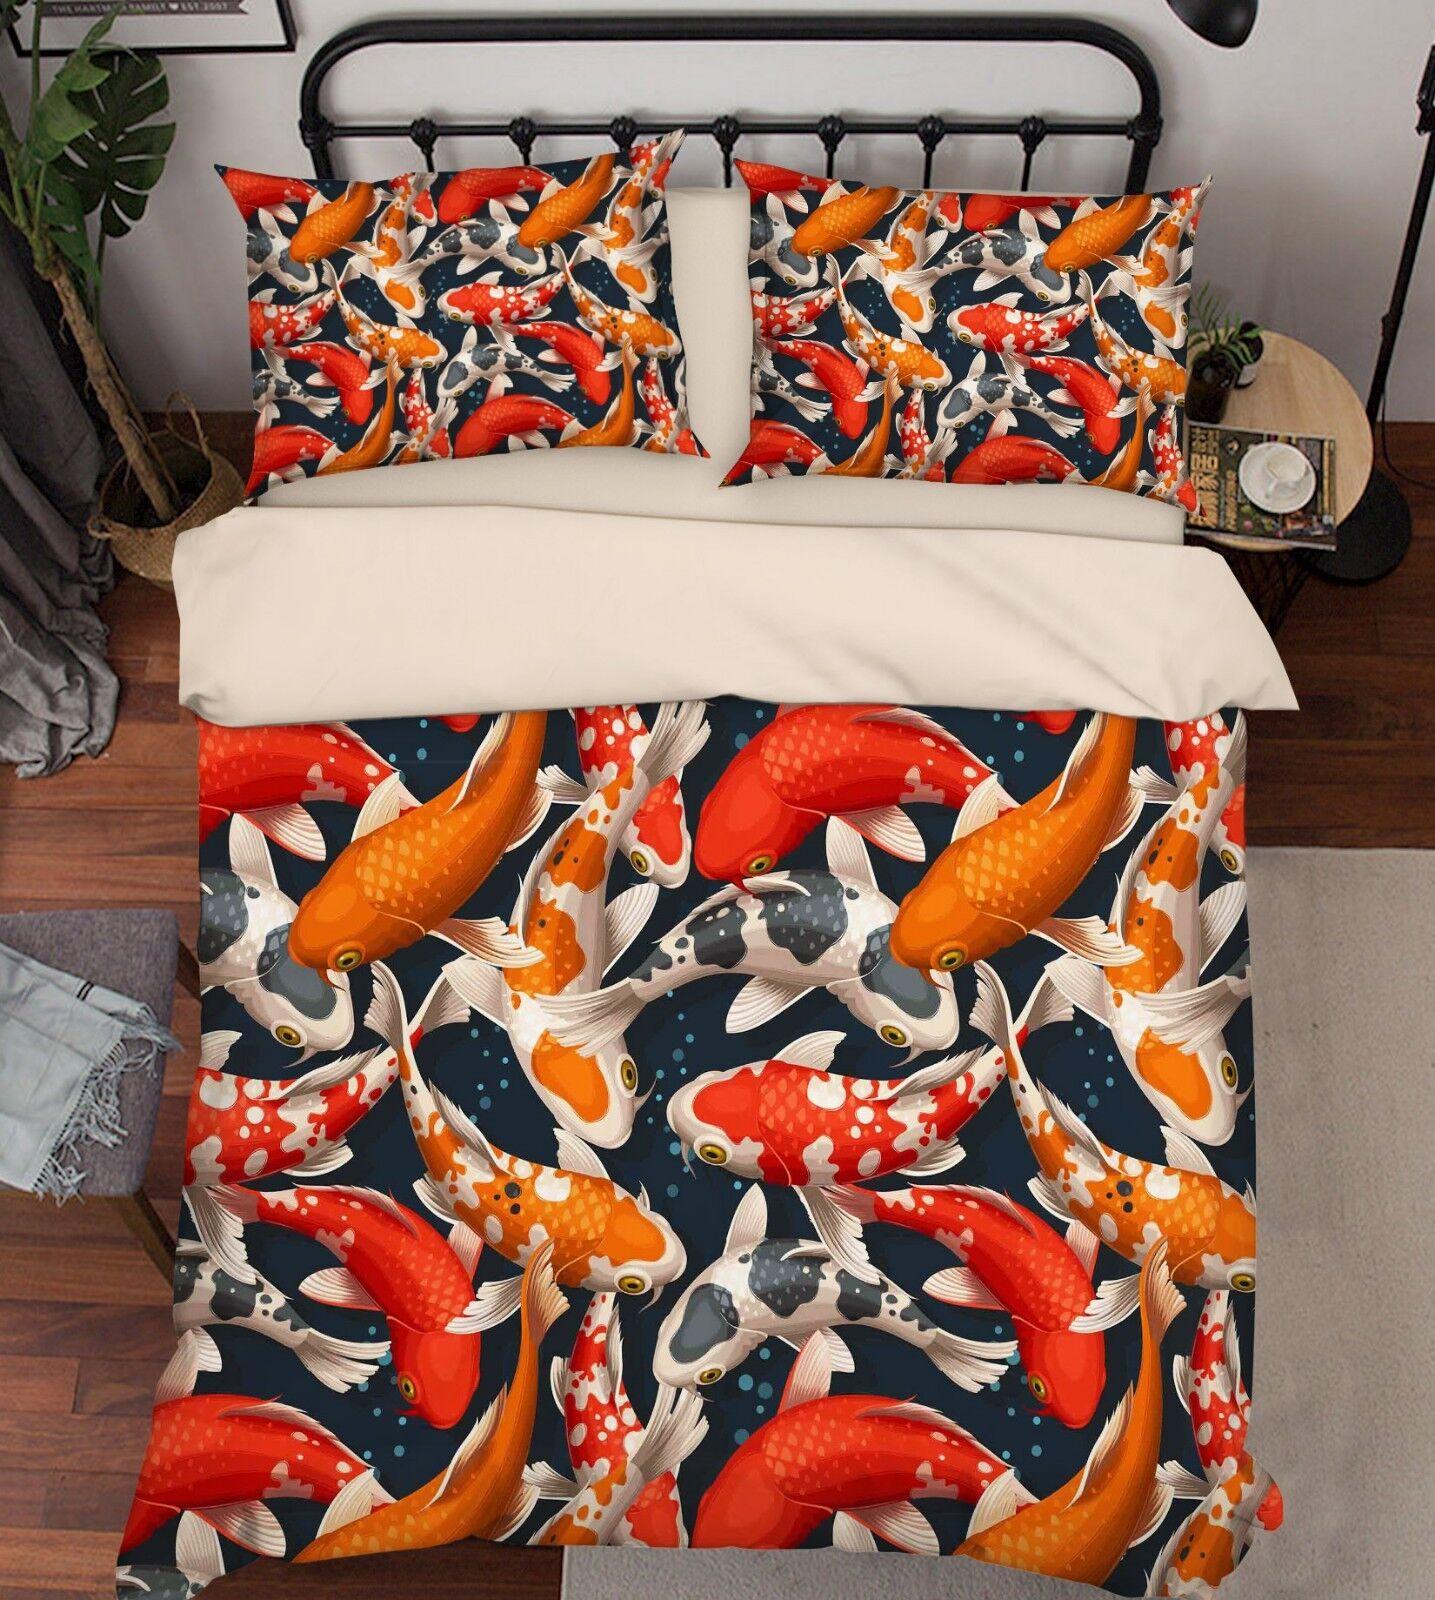 3D Pond Carp Paint 76 Bed Pillowcases Quilt Duvet Cover Set Single King UK Lemon